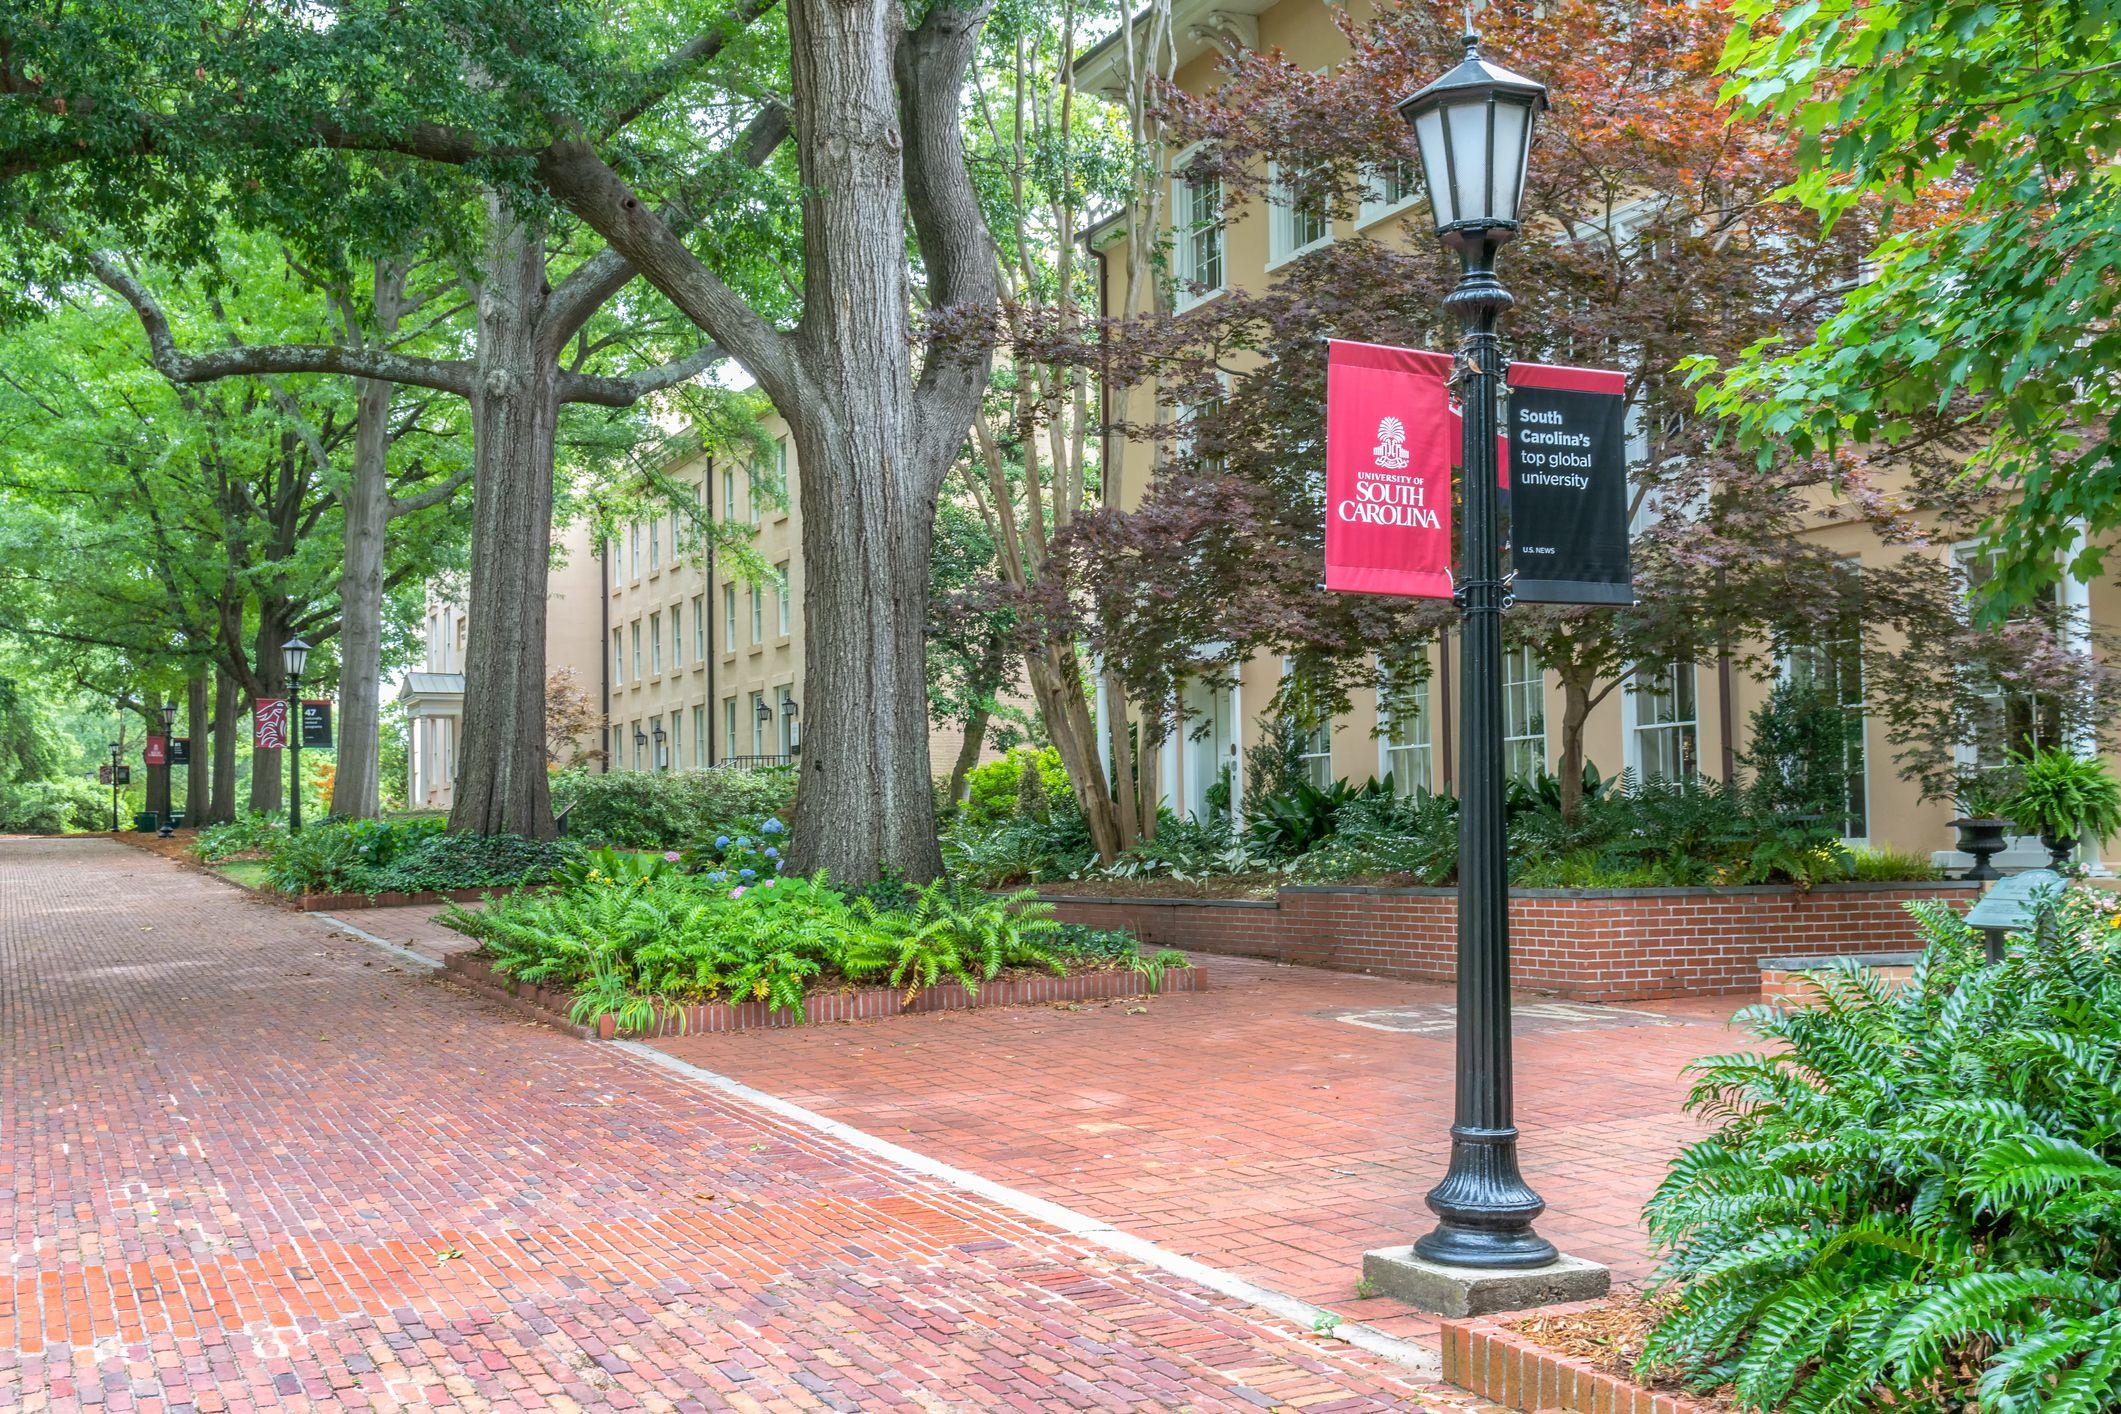 University of south carolina application essay